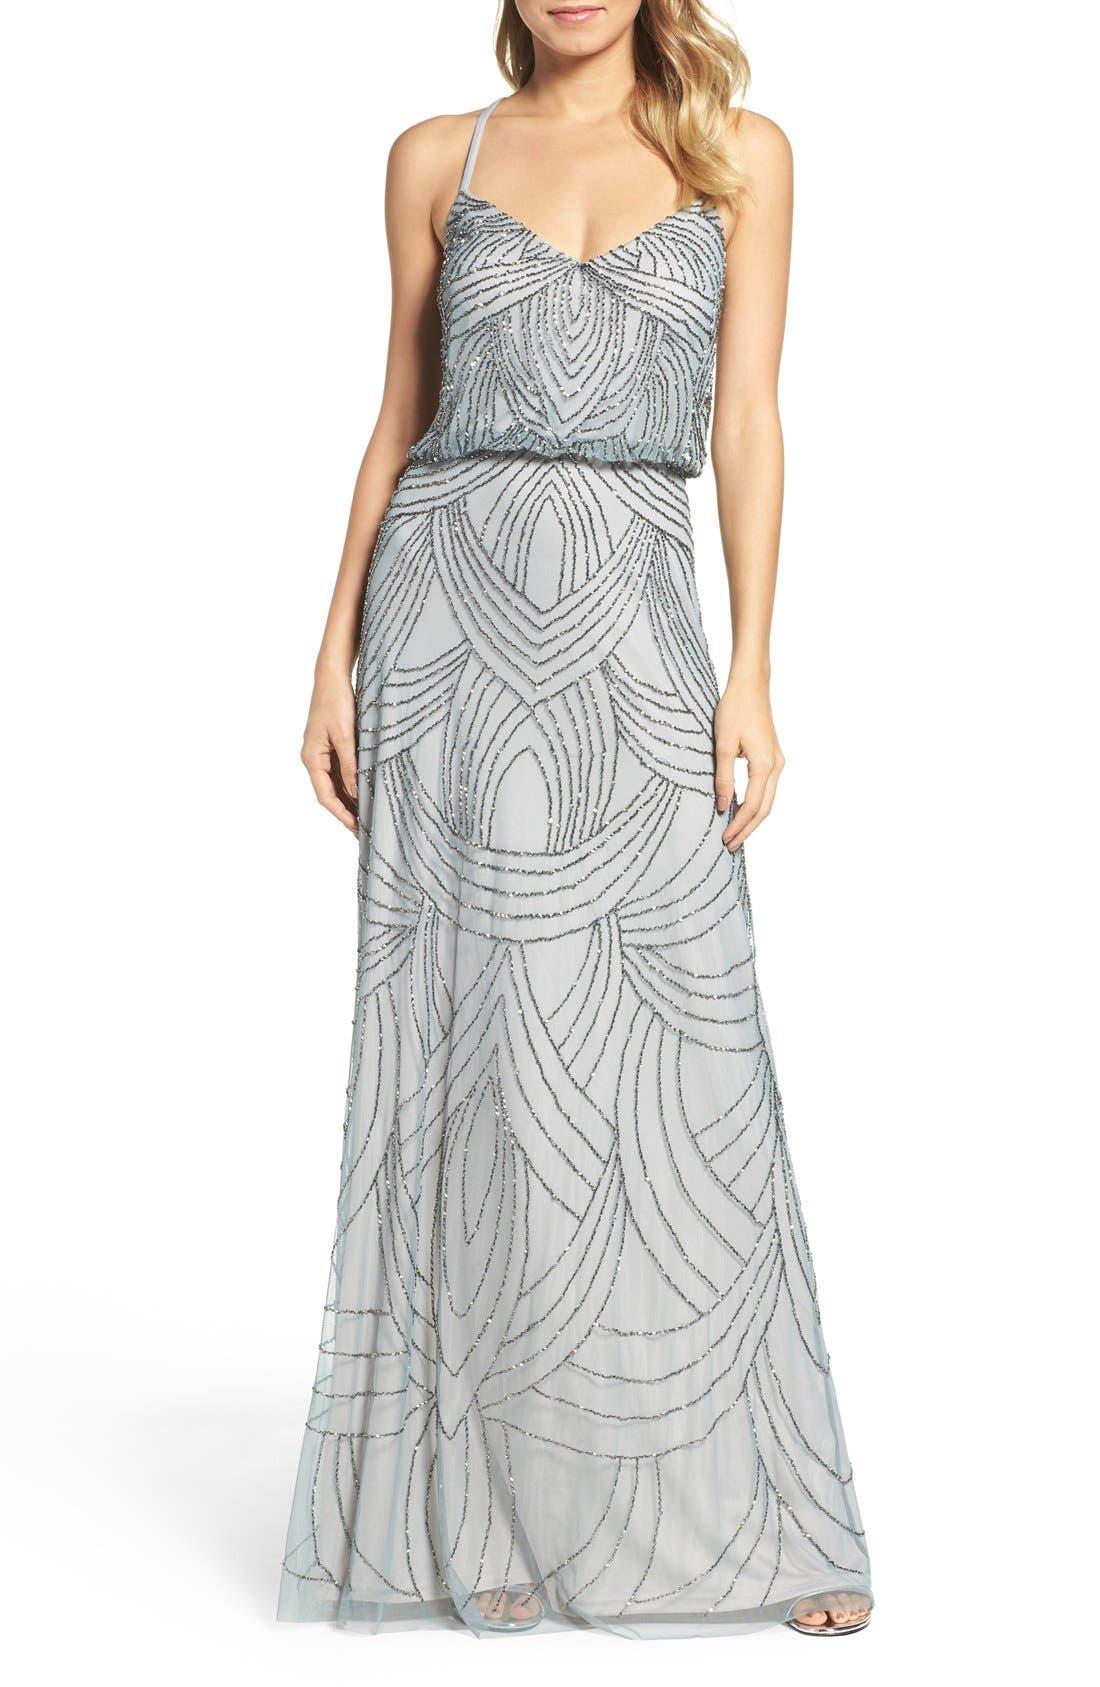 Adrianna Papell Beaded Chiffon Blouson Gown